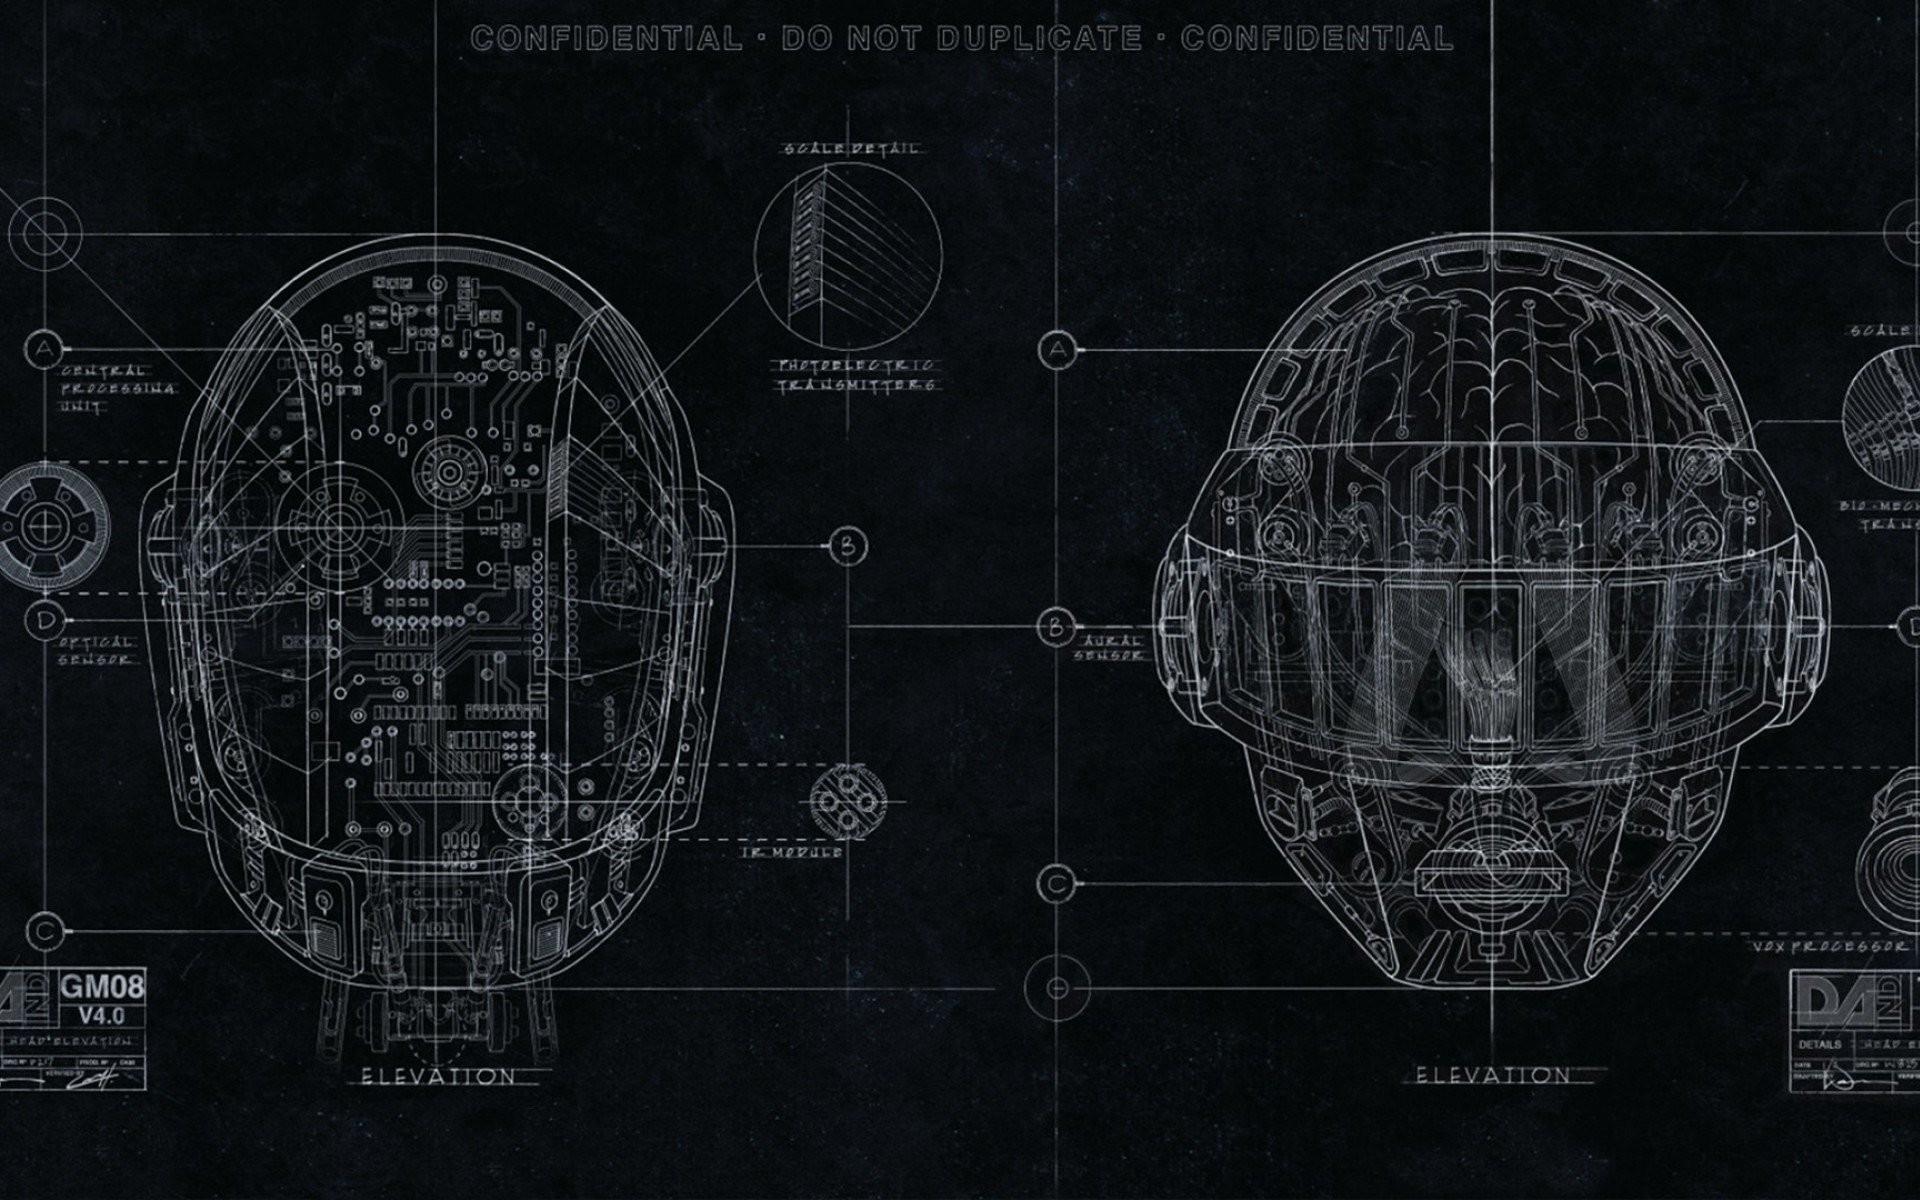 Daft Punk EDM 2048×1152 Resolution